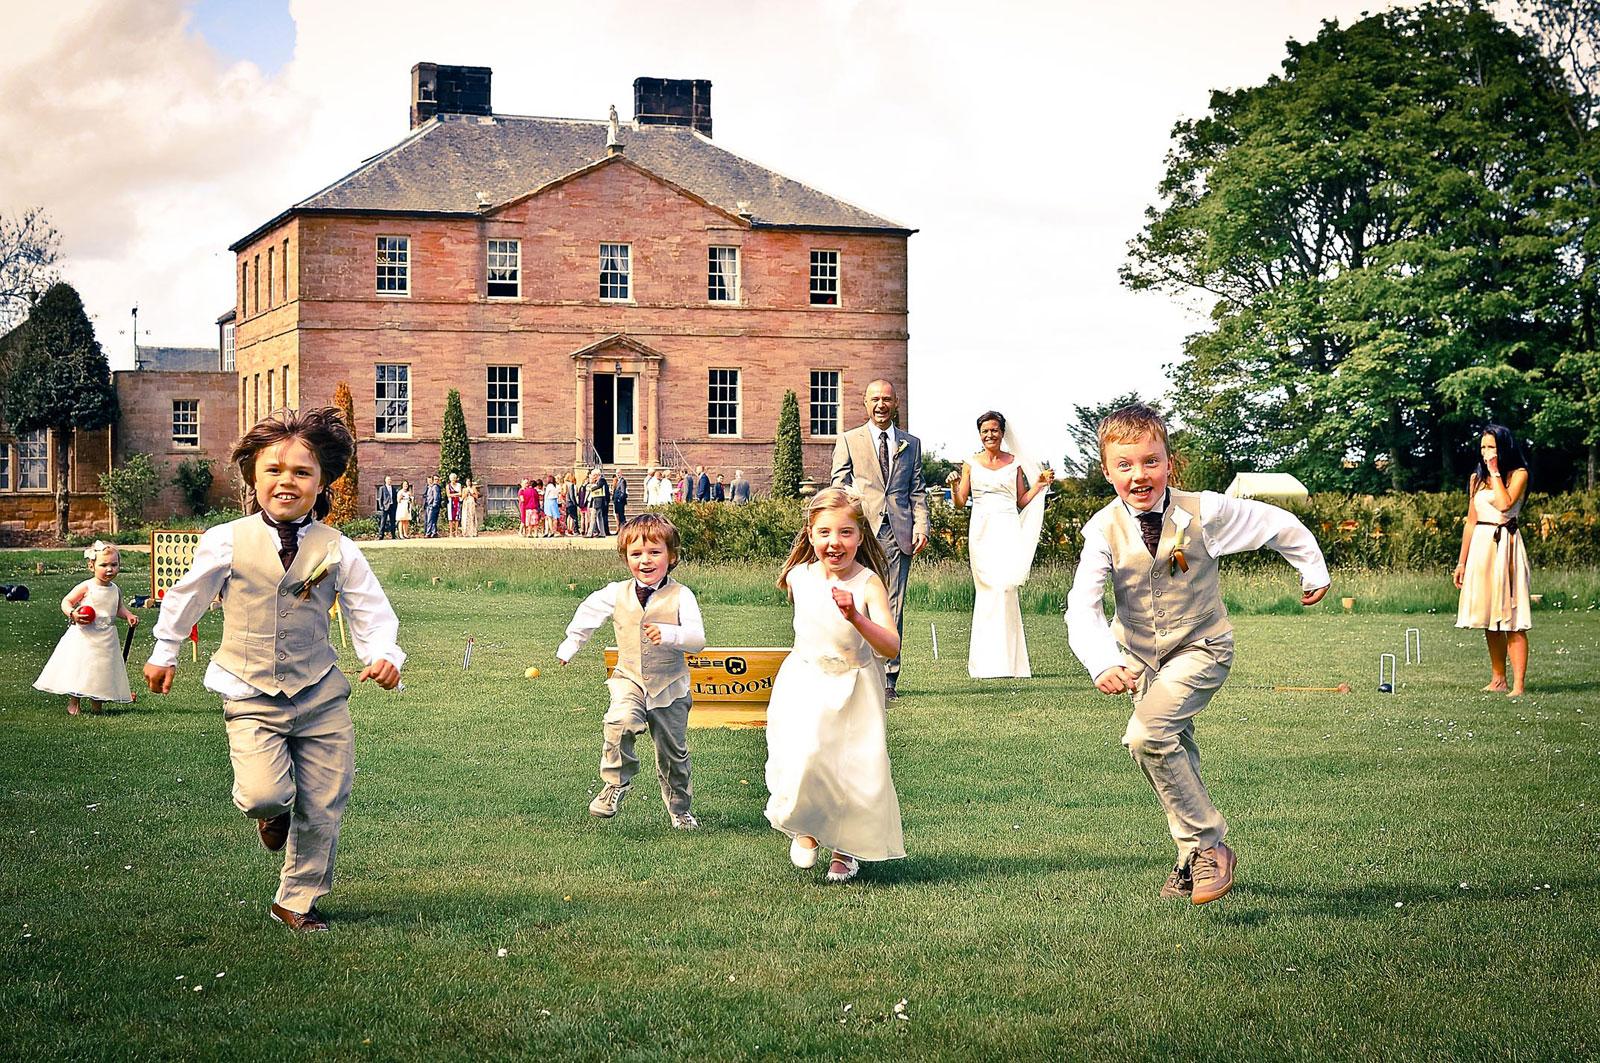 Wedding Reception Venues North East : Multiple award wins for north east wedding venue vows